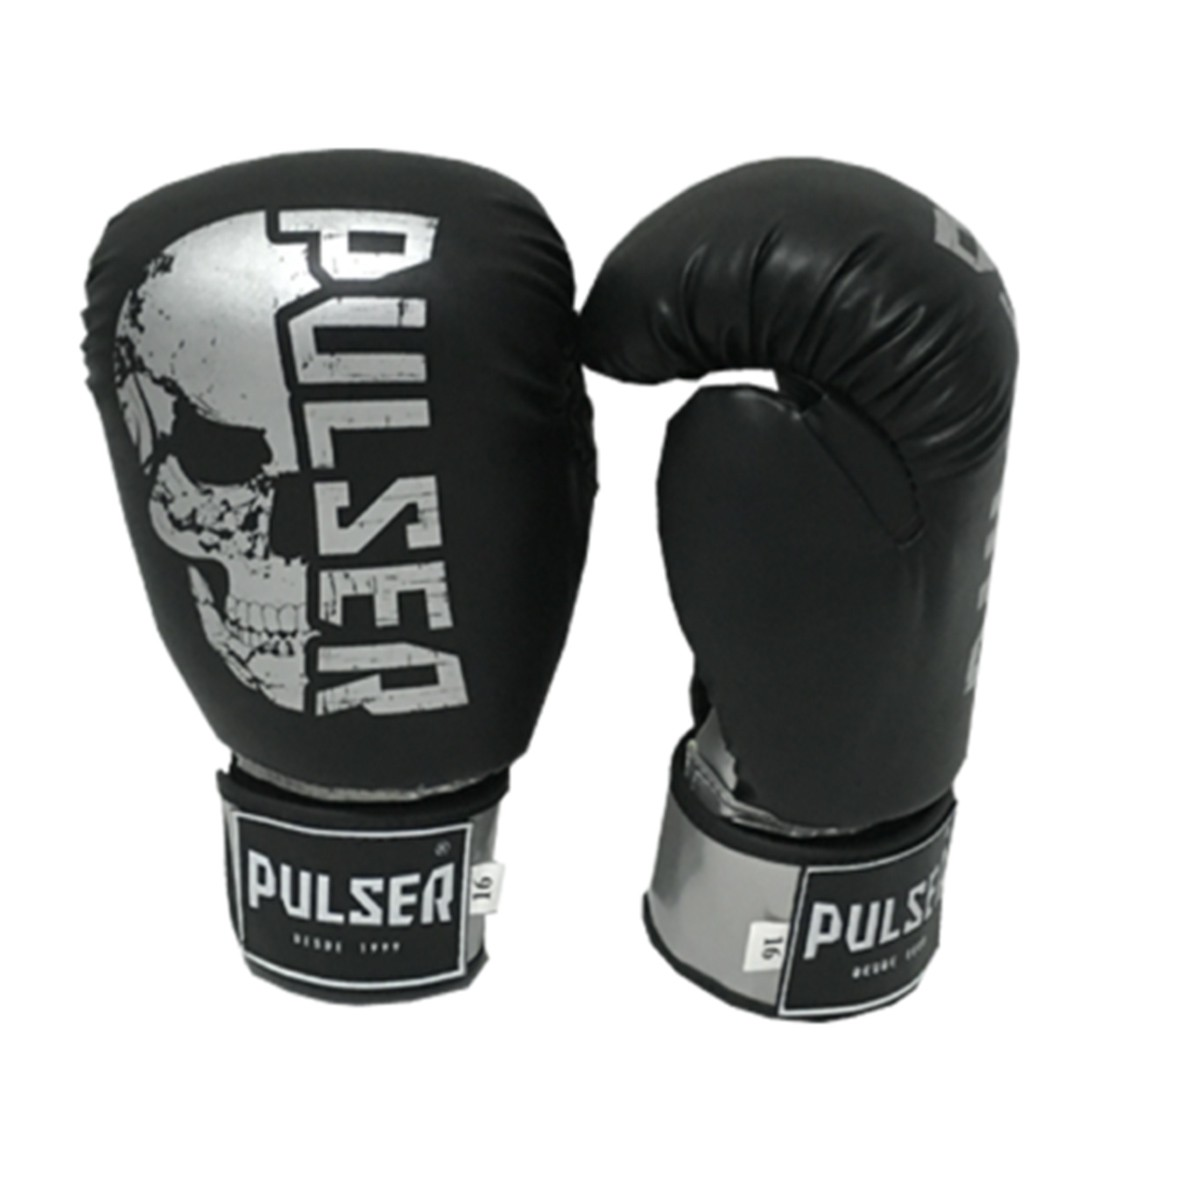 Kit de Muay Thai / Kickboxing 16oz - Preto Caveira - Pulser  - PRALUTA SHOP